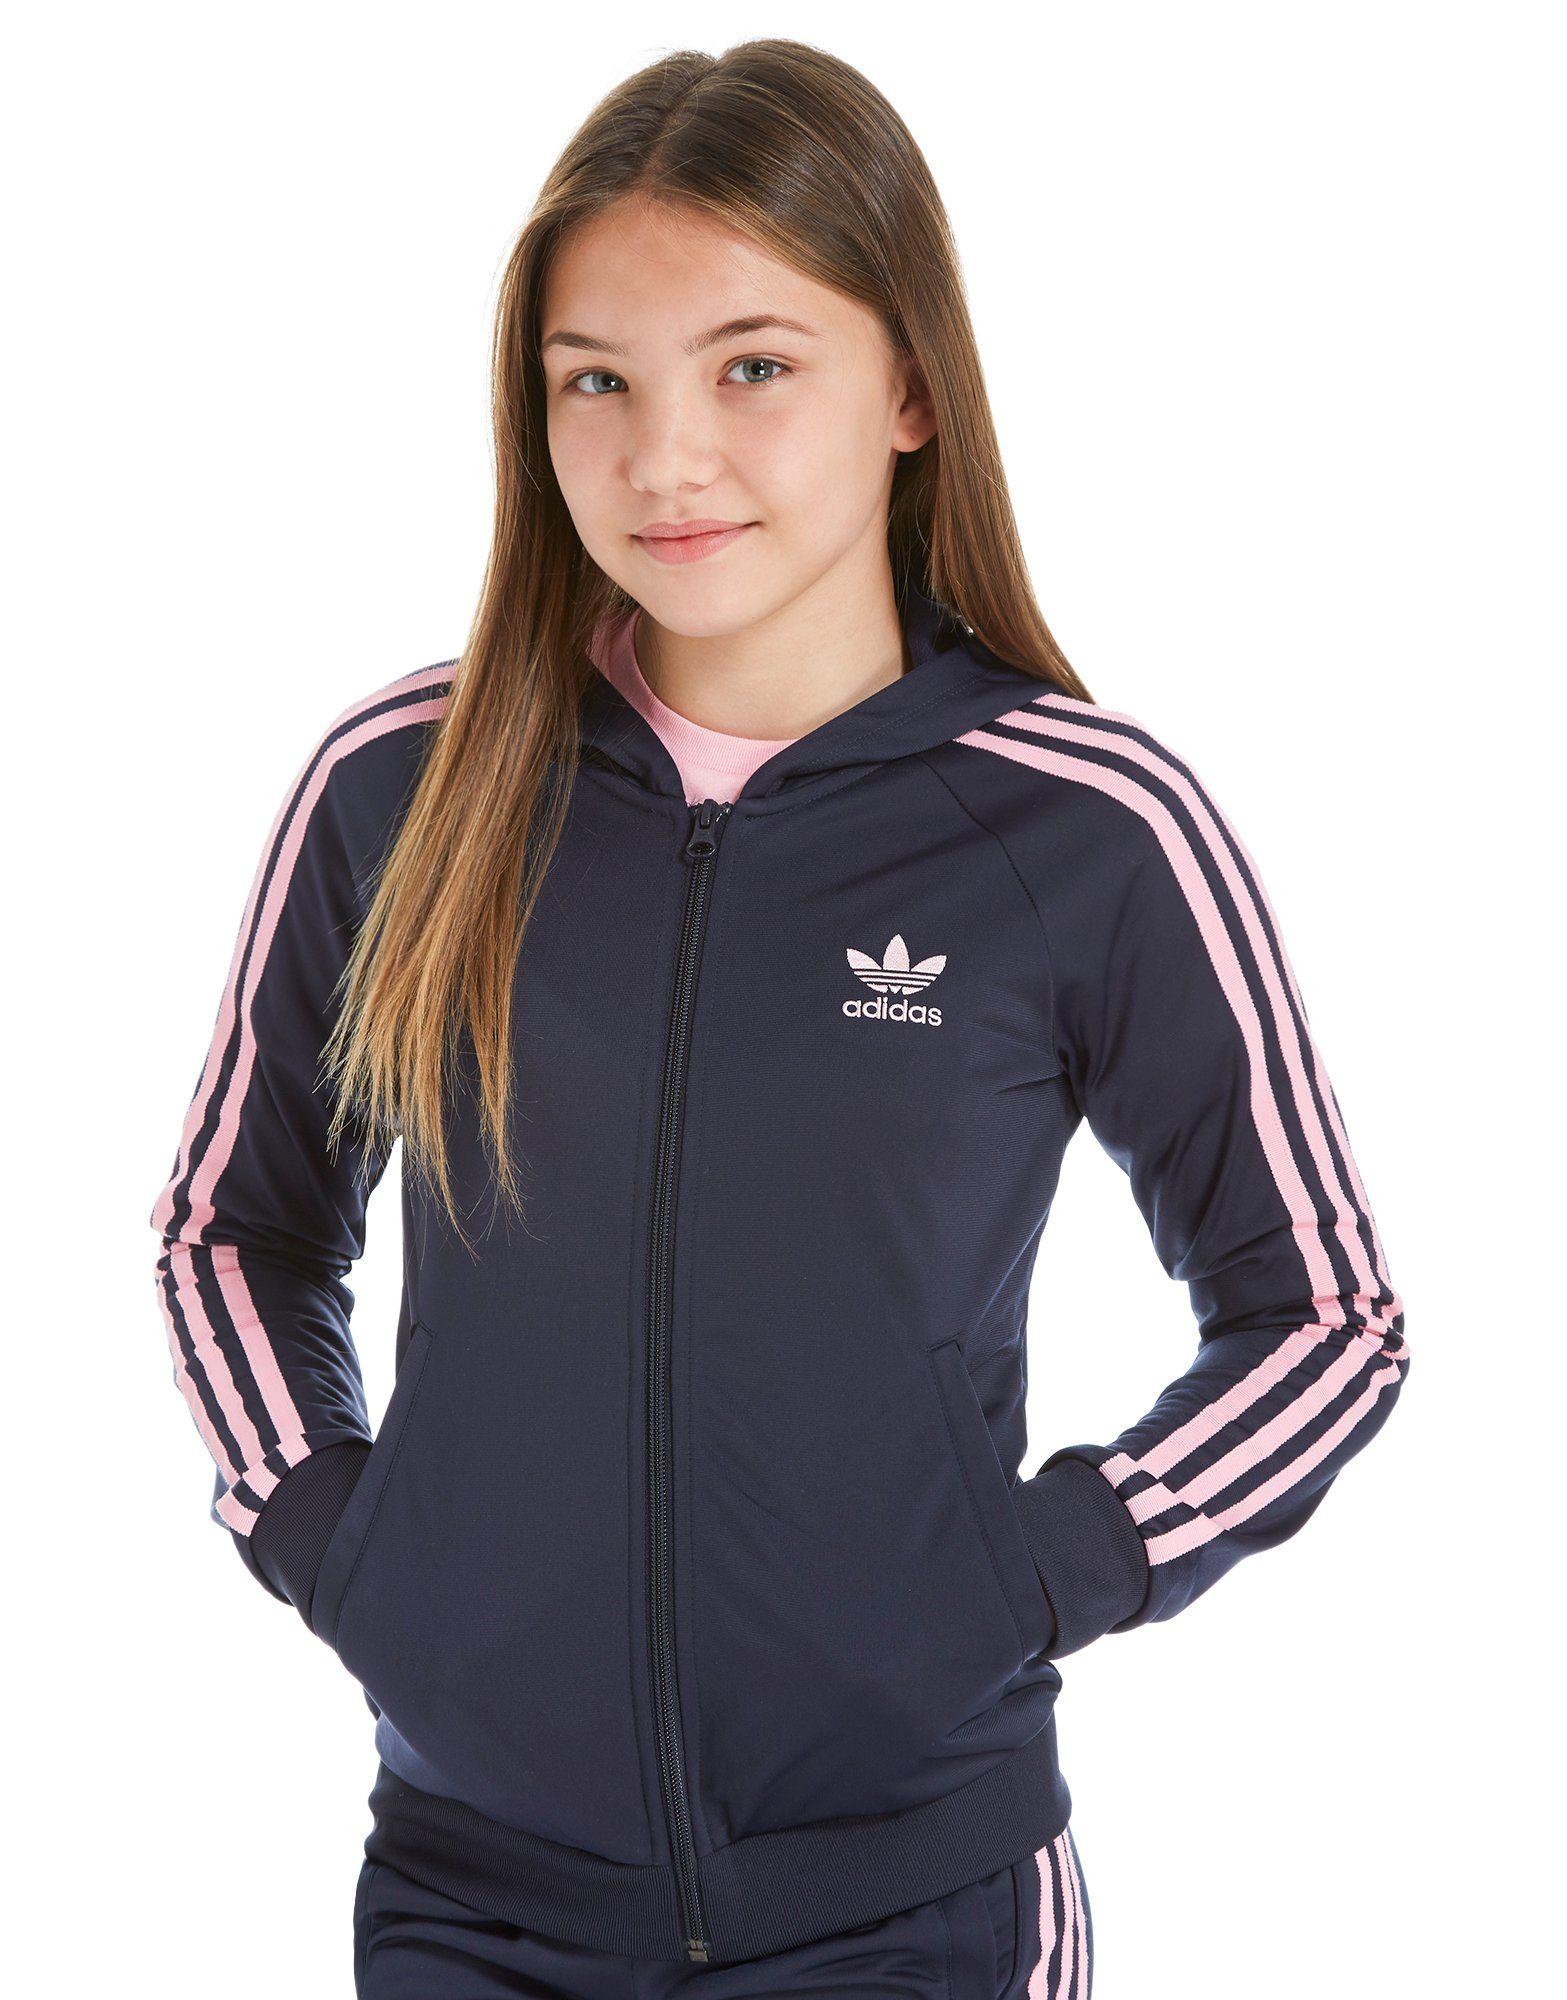 adidas Originals Girls Poly Full Zip Hoody Junior